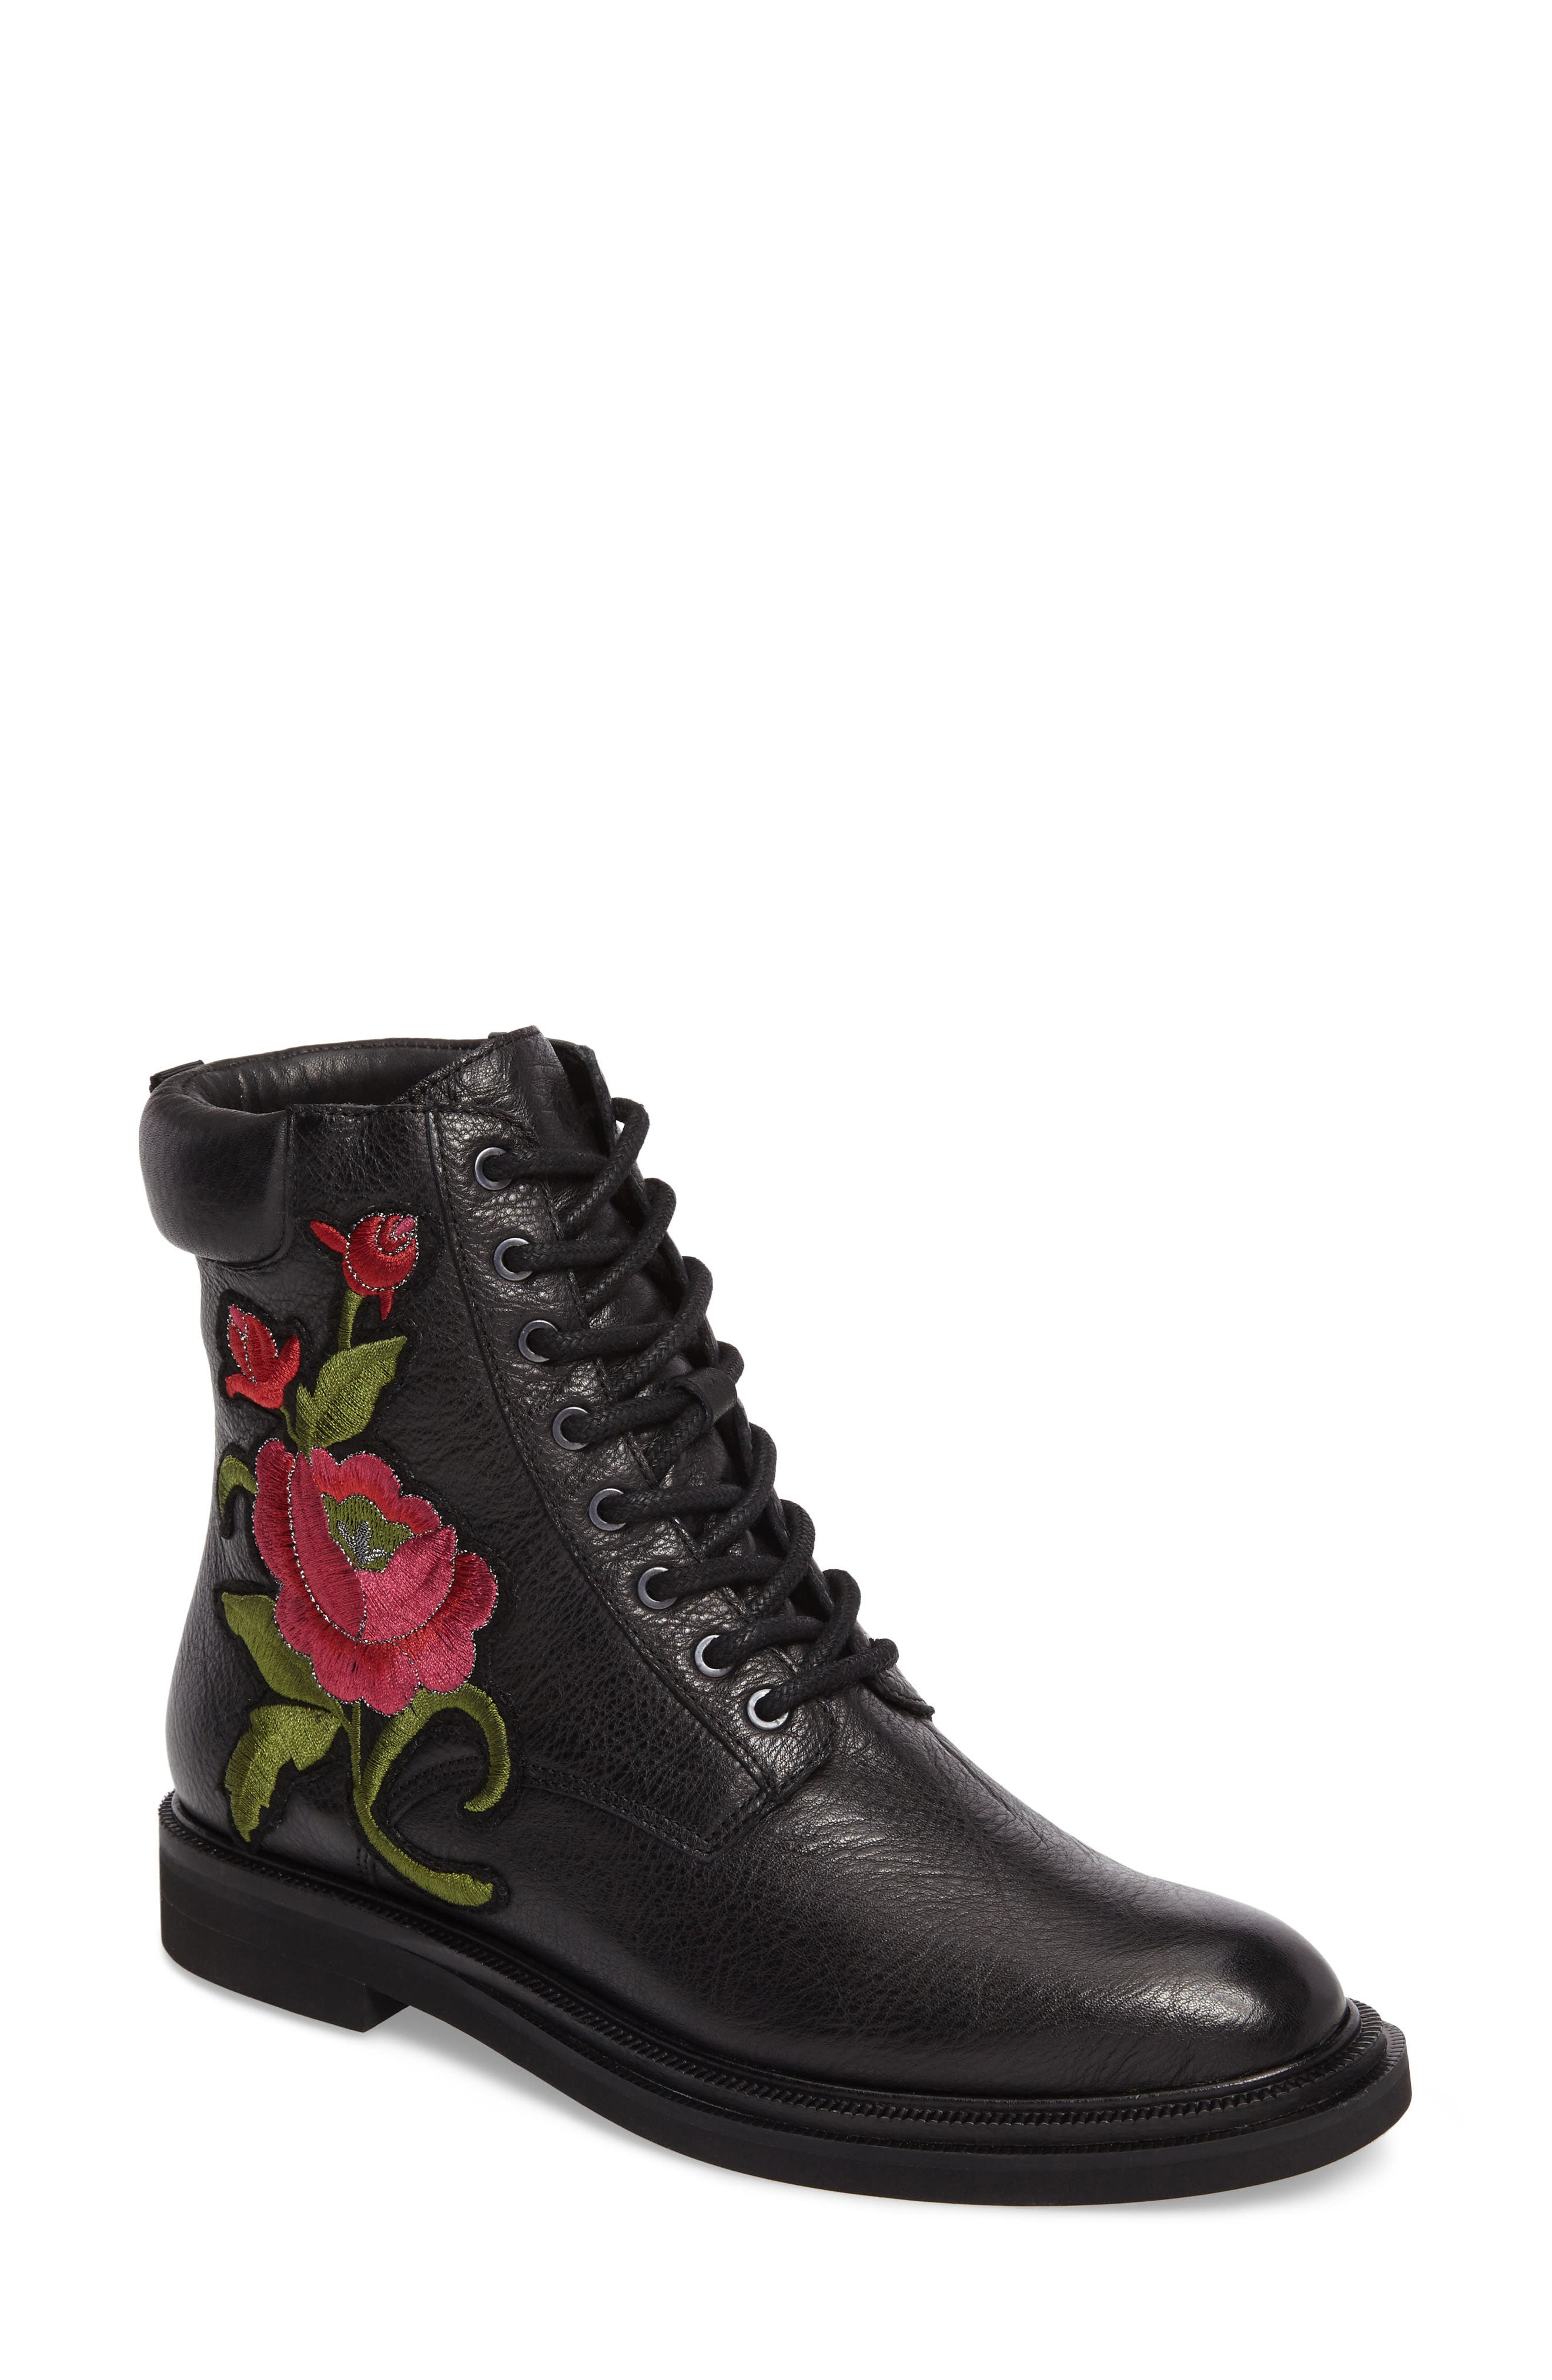 Ashton 2 Embroidered Boot,                             Main thumbnail 1, color,                             001